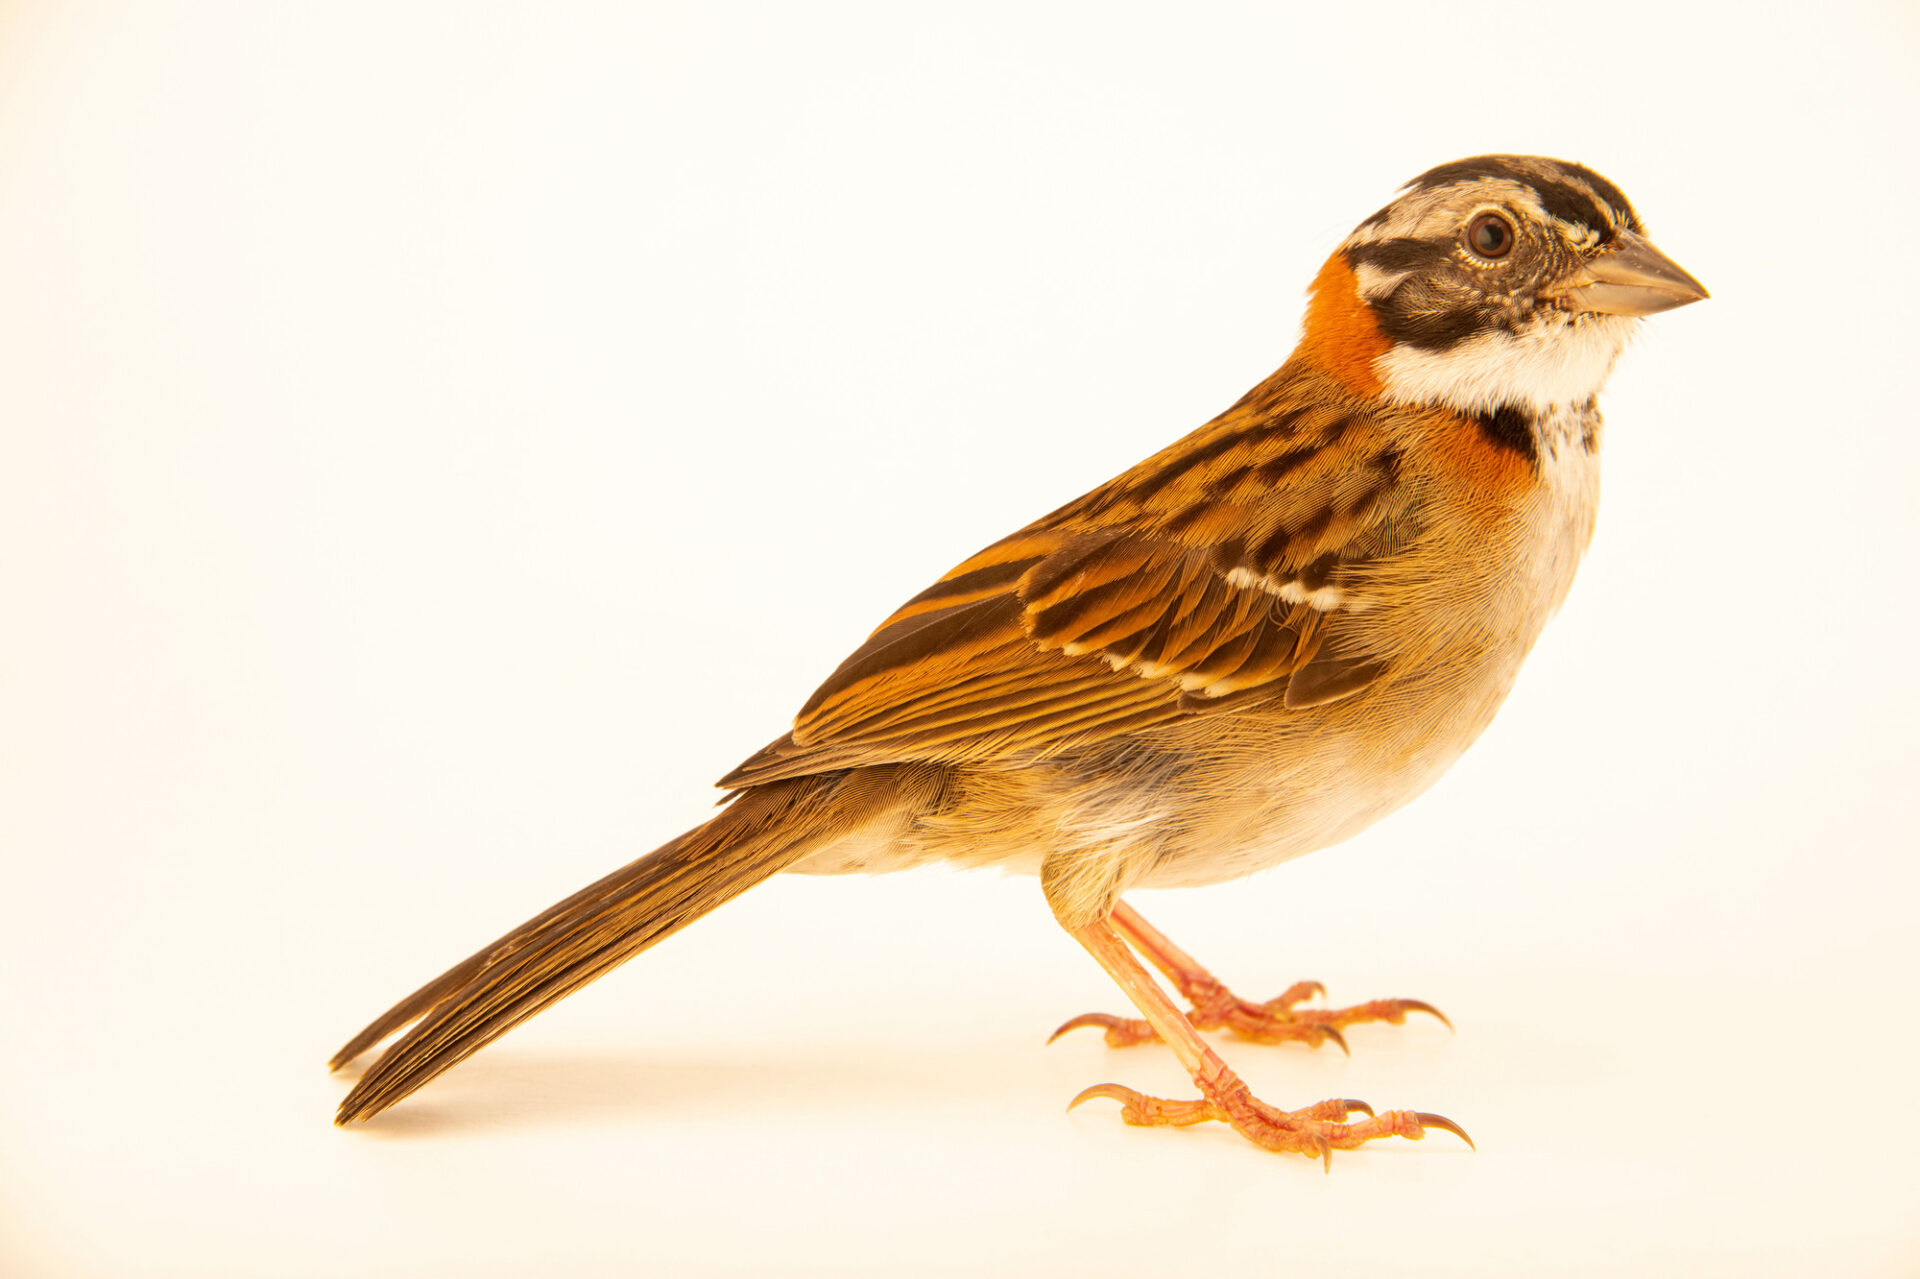 Photo: A rufous-collared sparrow (Zonotrichia capensis subtorquata) at the Membeca Lagos Farm, near Rio de Janeiro, Brazil.